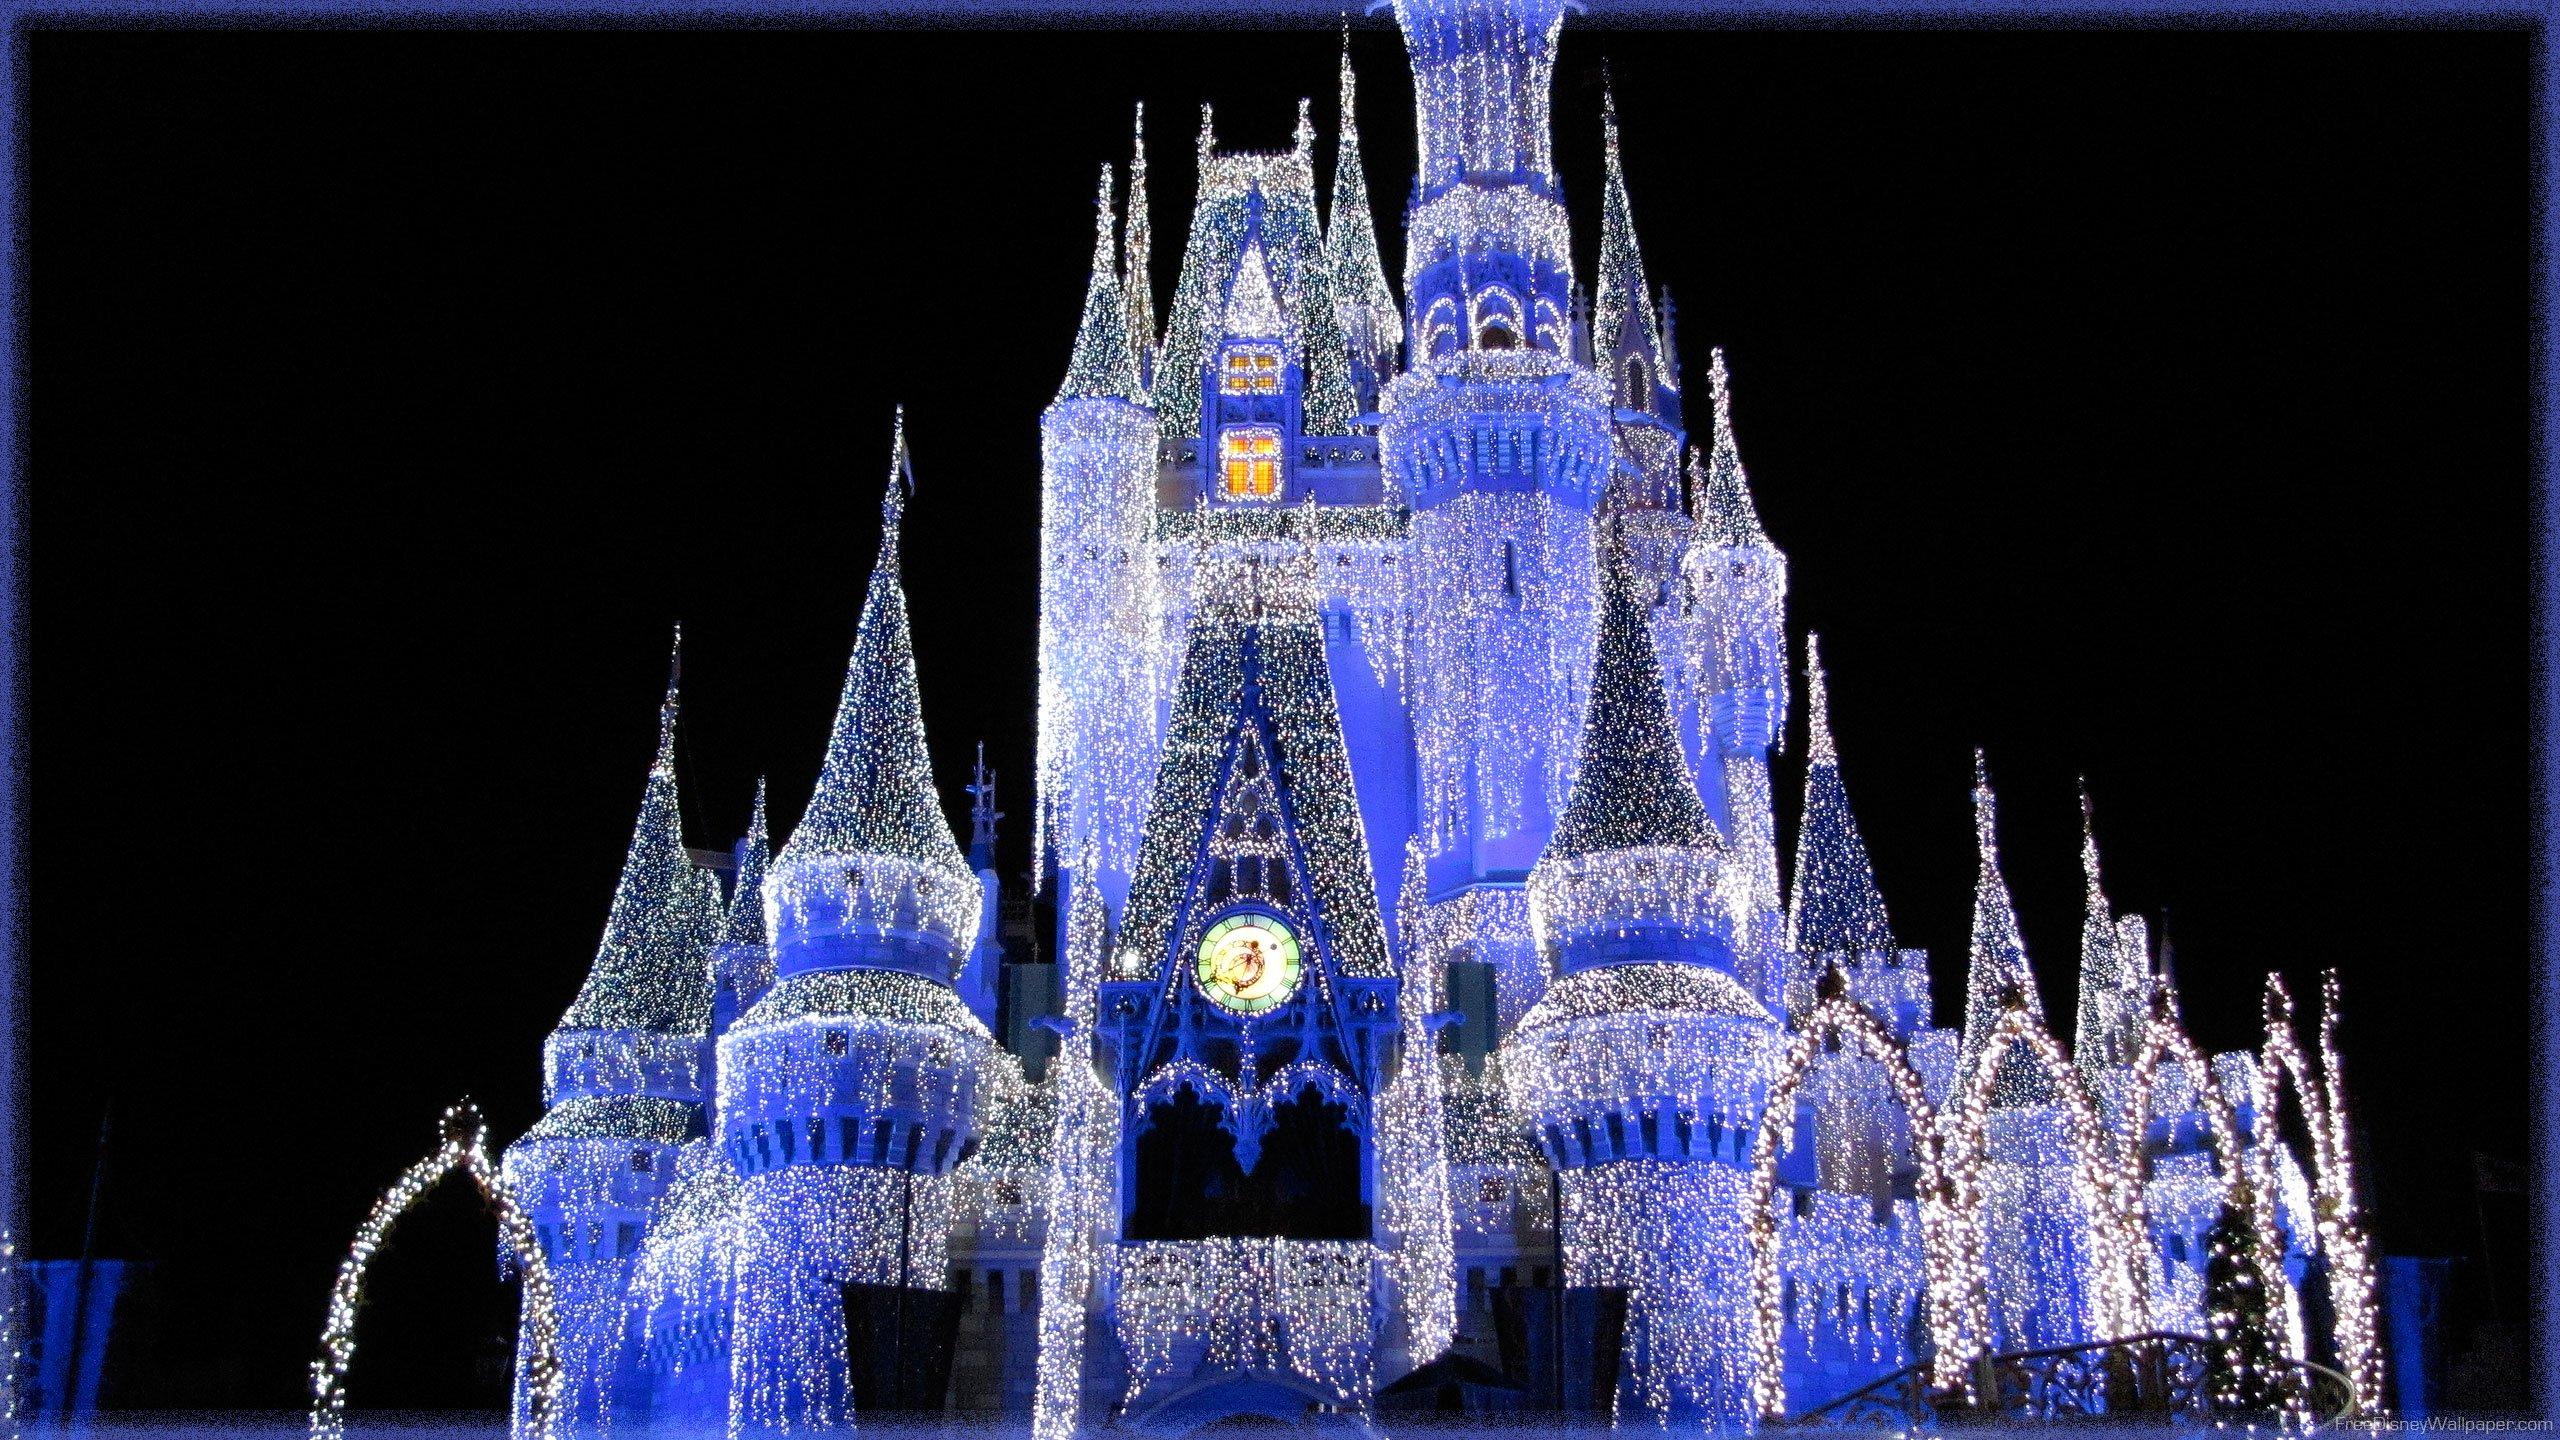 Disney Wallpaper Disney Wallpapers Cinderella Castle 2560x1440